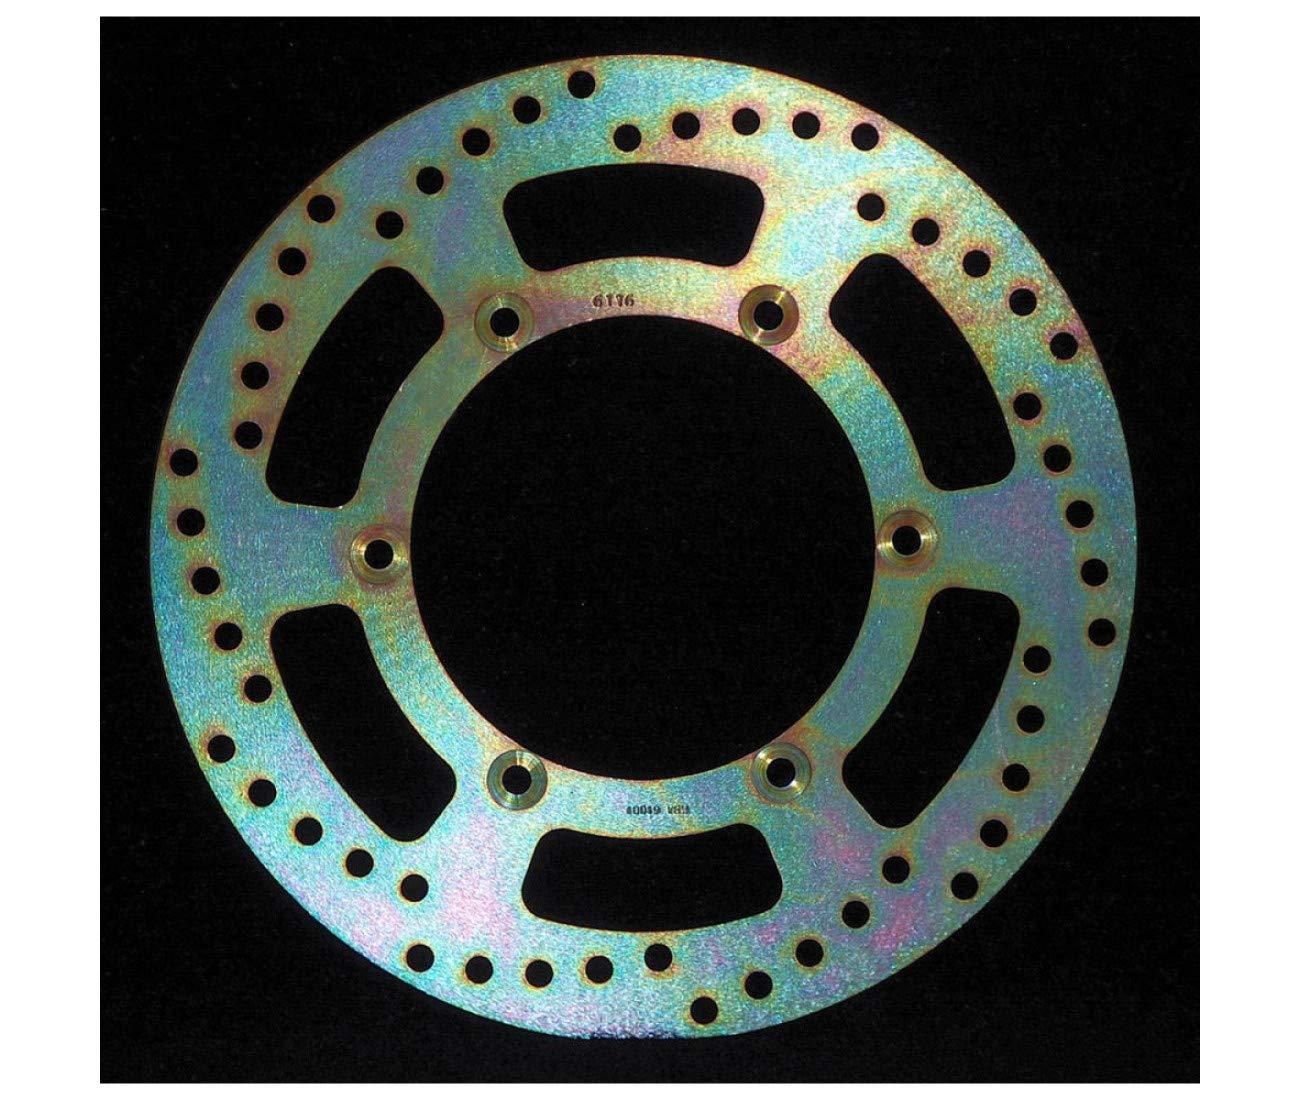 YAMAHA 125 TDR-93/04 / XTZ 660 TENERE-90/95-DISQUE DE FREIN AVANT-MD6116D